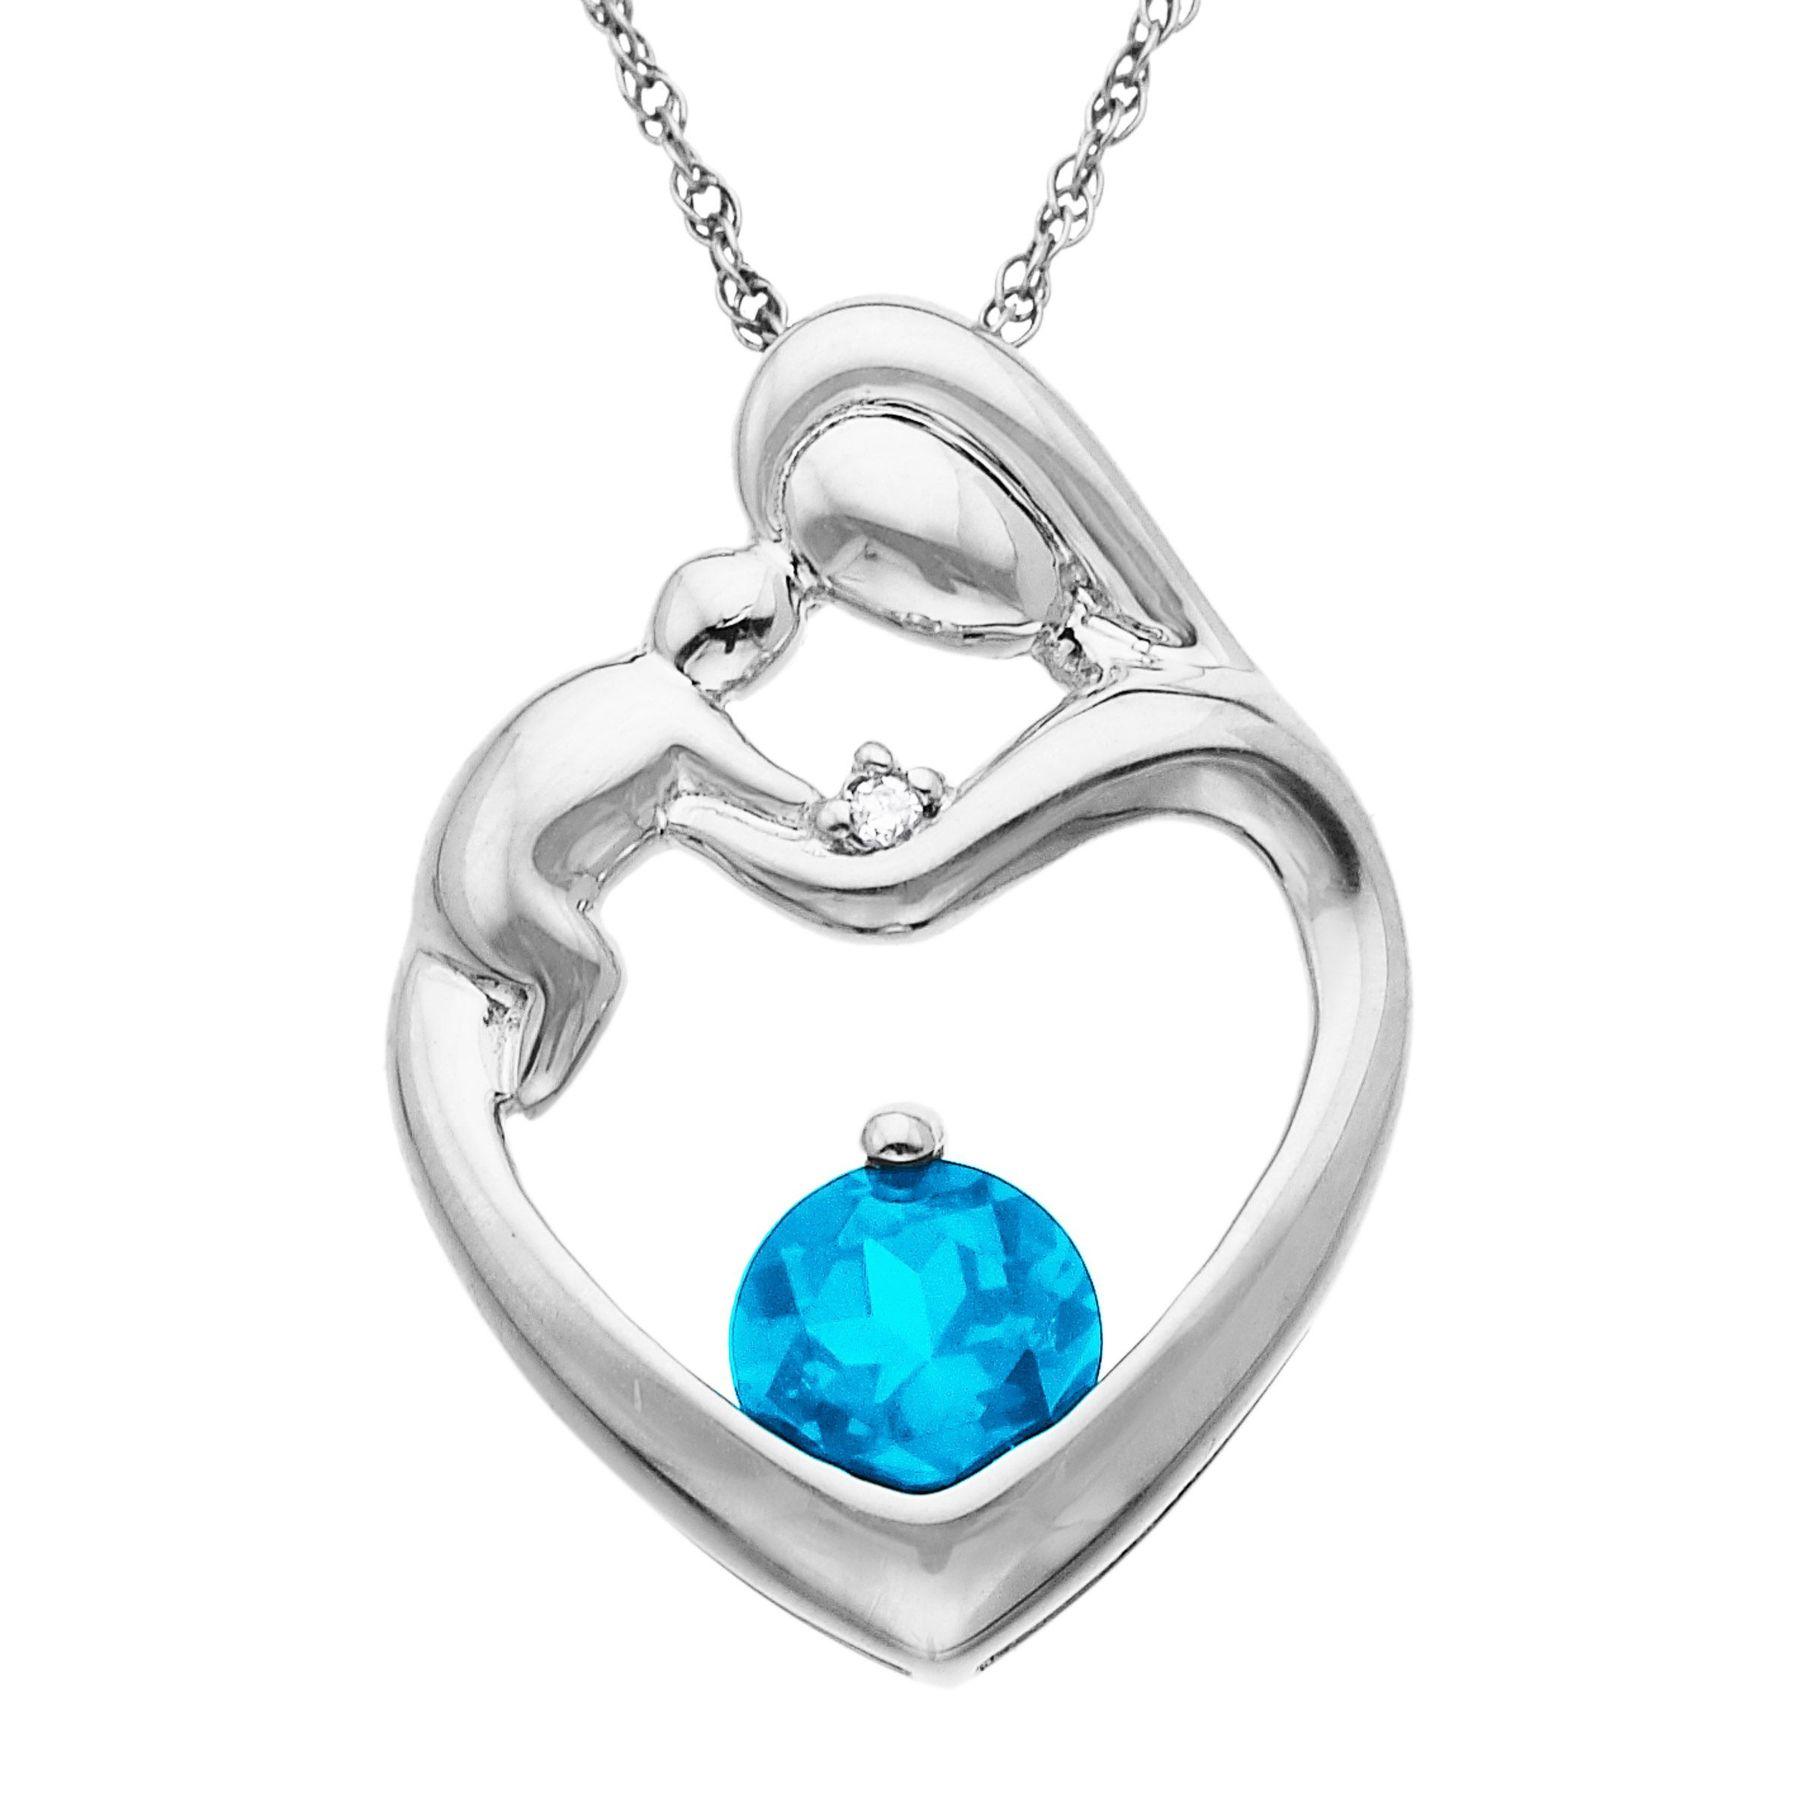 Finecraft 5/8 ct Blue Topaz Mother's Jewel Pendant with Diamond